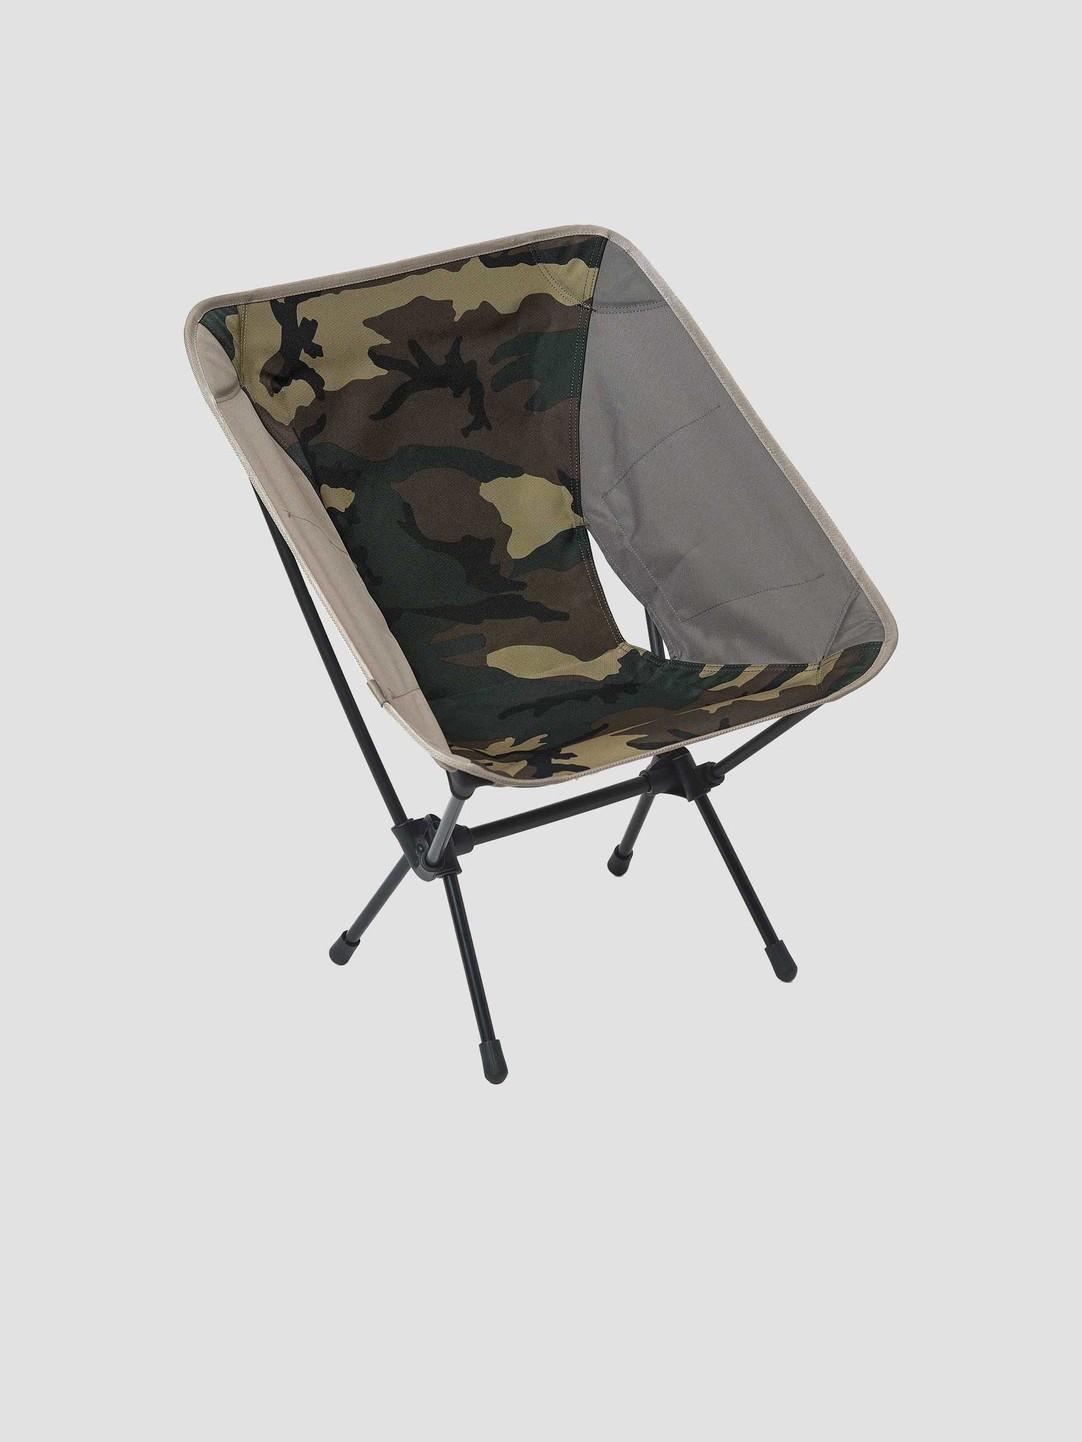 Carhartt WIP Carhartt WIP Helinox Valiant 4 Tactical Chair Black Air Force Grey Leather I021387-0DL00